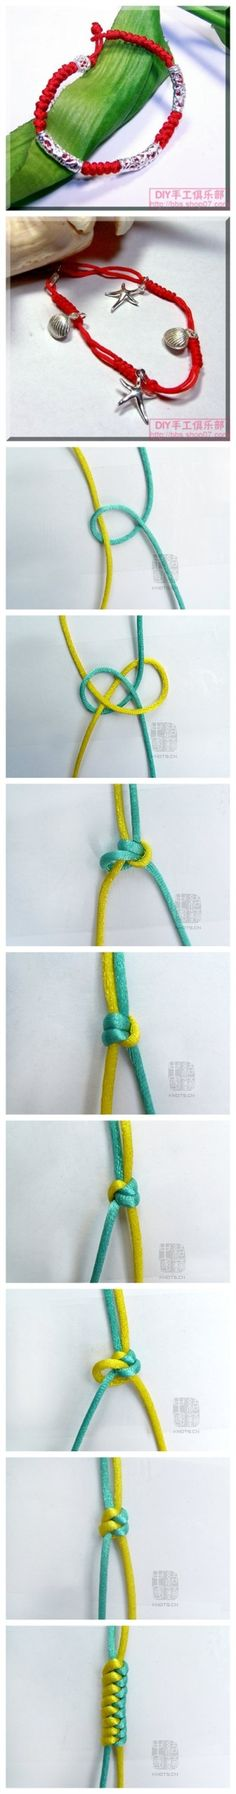 DIY Weave Bracelet DIY Weave Bracelet by diyforever